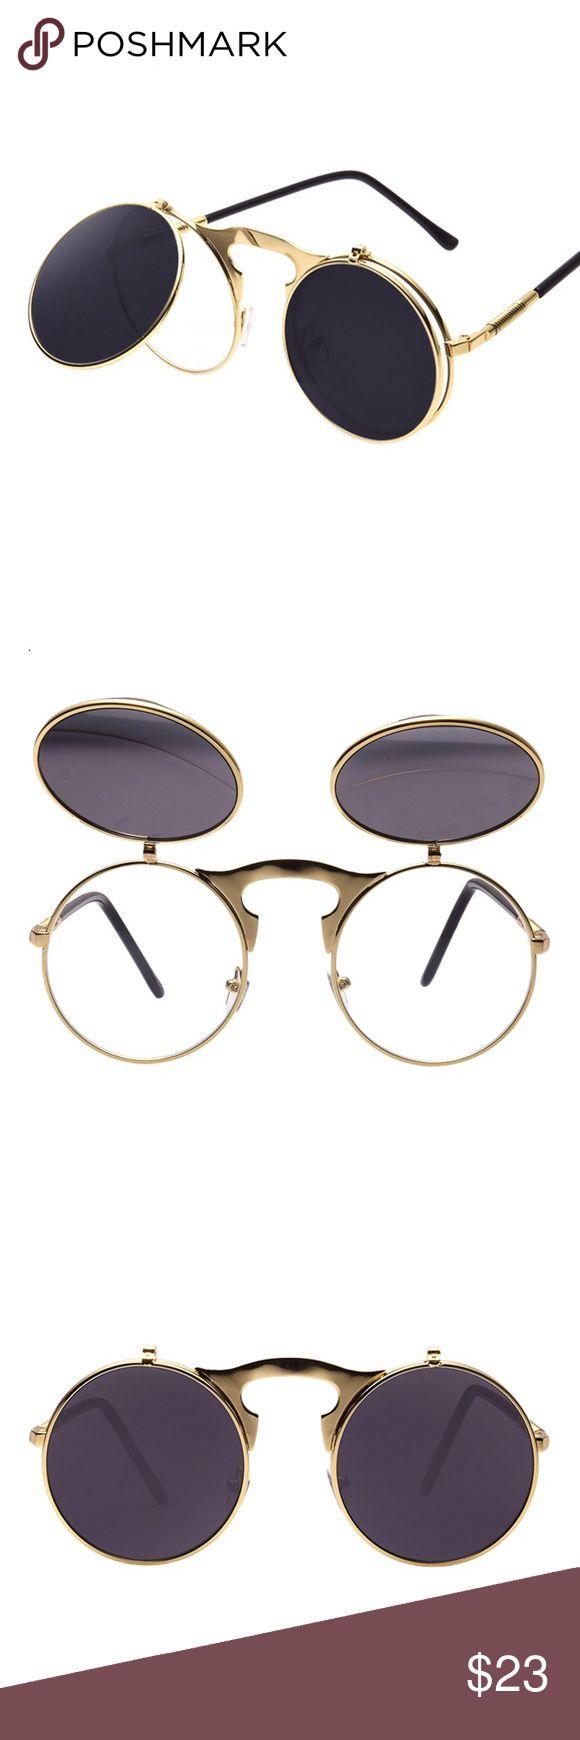 Men's Retro Gold Frame Flip Sunglasses Men's Retro Gold Frame Flip Sunglasses  Len's Material: Polycarbonate  Frame Material: Metal  Len's width : 4.6 cm  Style: Round Tsv Jewelers Accessories Glasses